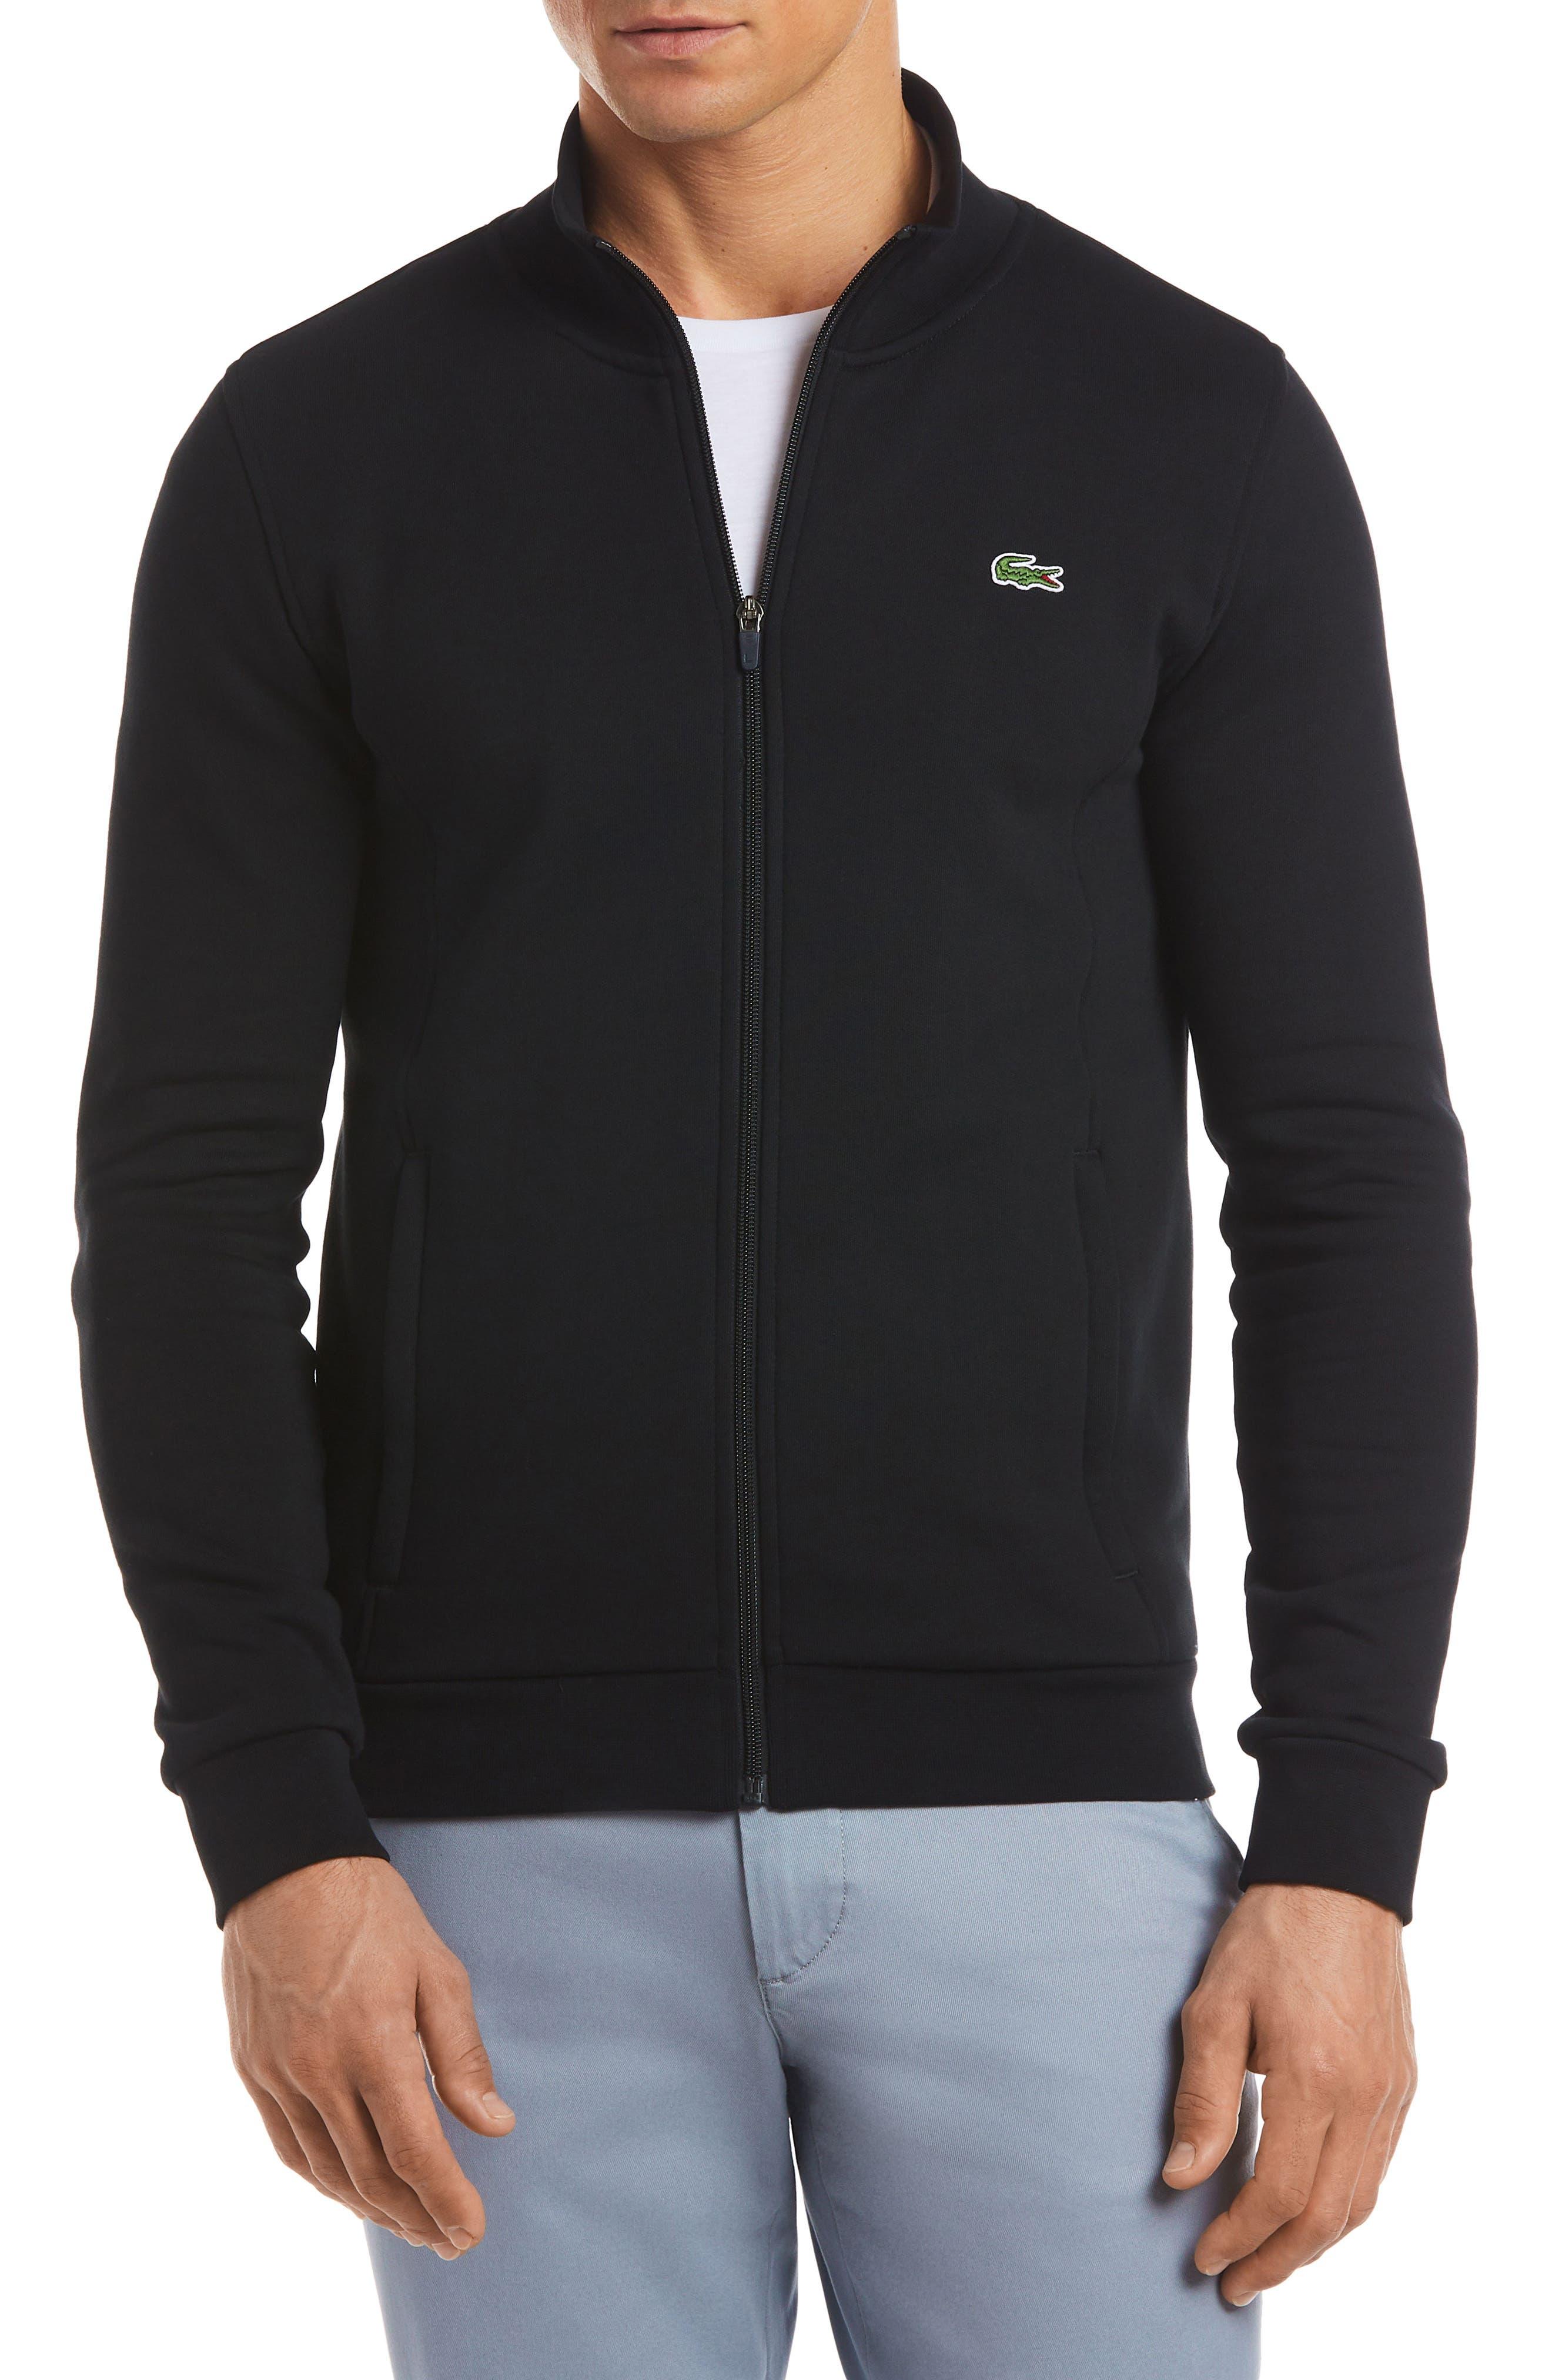 LACOSTE, Fleece Zip Jacket, Main thumbnail 1, color, 001